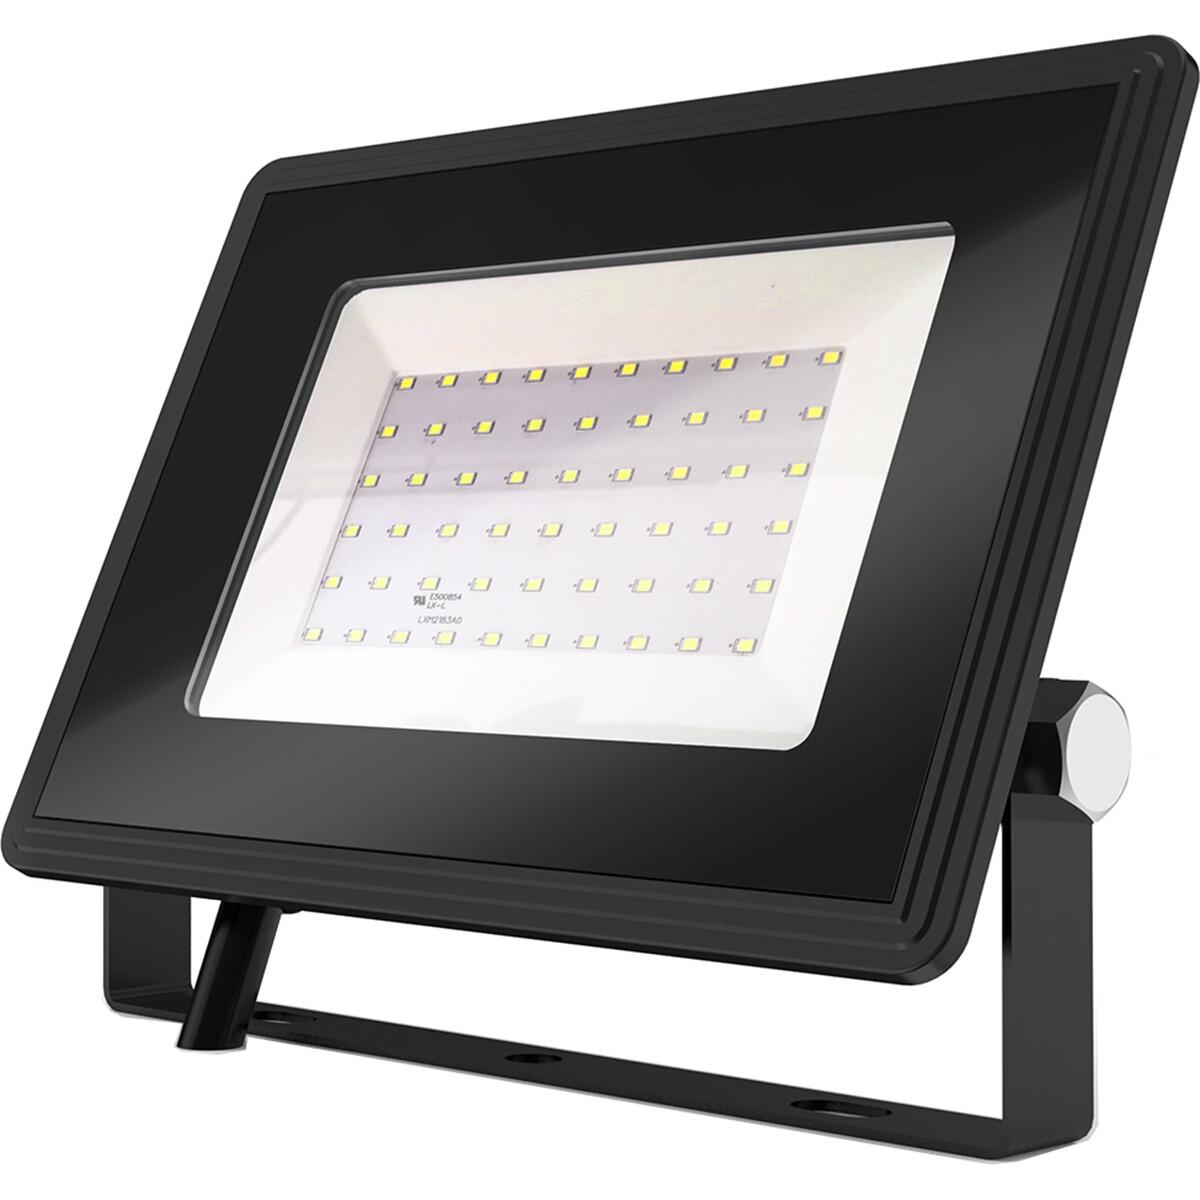 LED Bouwlamp 50 Watt - LED Schijnwerper - Aigi Iglo - Helder/Koud Wit 6400K - Waterdicht IP65 - Mat Zwart - Aluminium